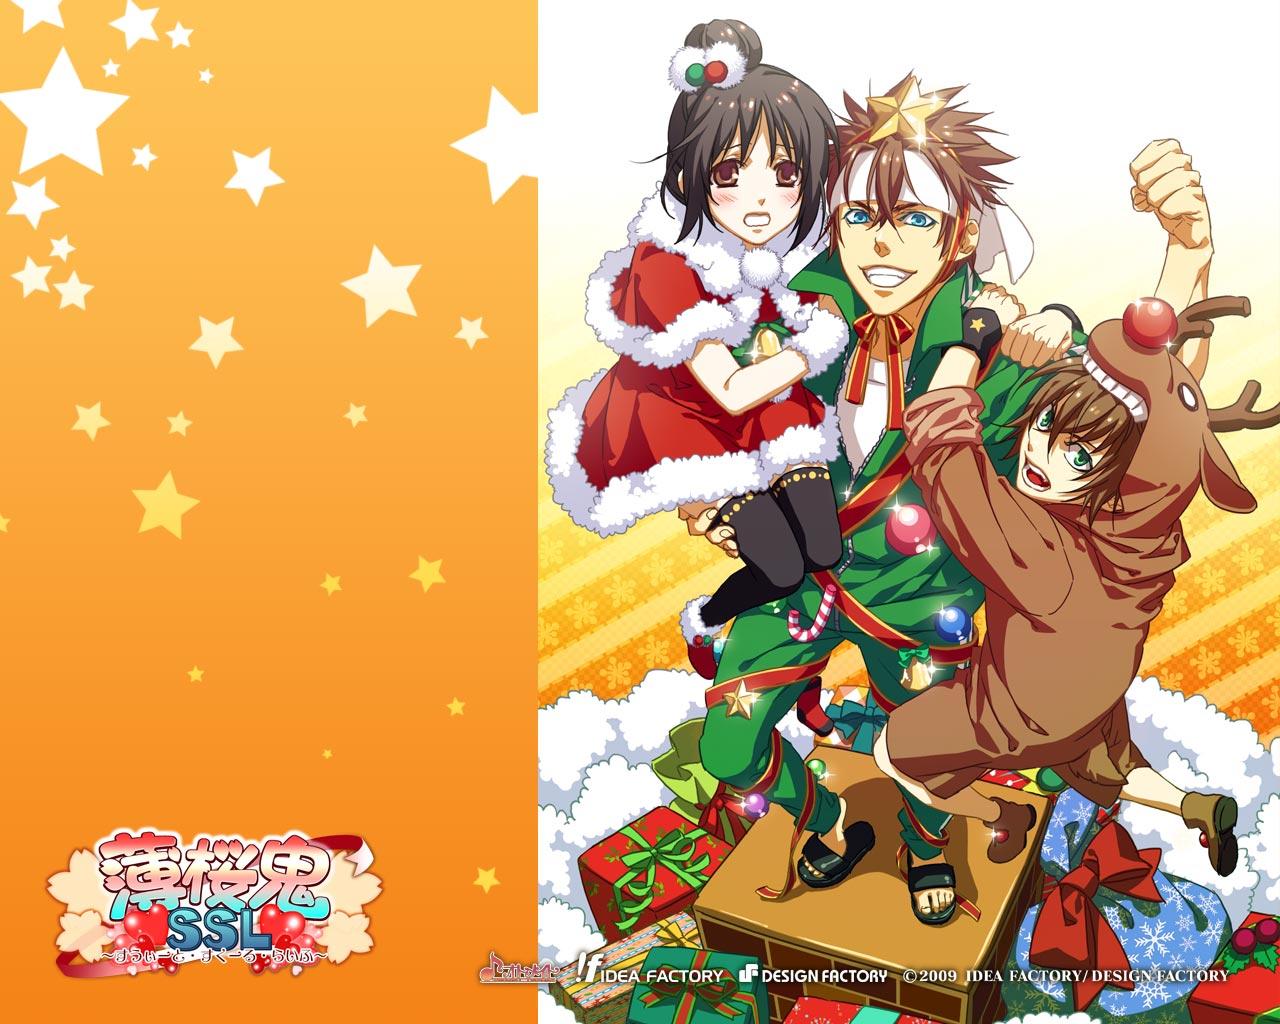 http://2.bp.blogspot.com/_js-AiFBl1-U/TM8D5J7492I/AAAAAAAAAEQ/PAlrIAHzlSY/s1600/hakuouki+SSL+christmas.jpg